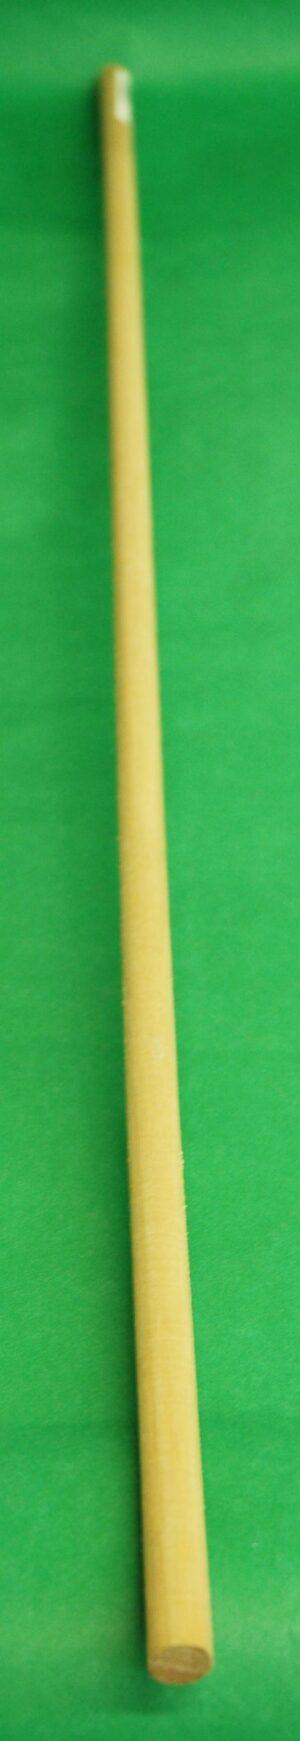 p 3996 DOWEL